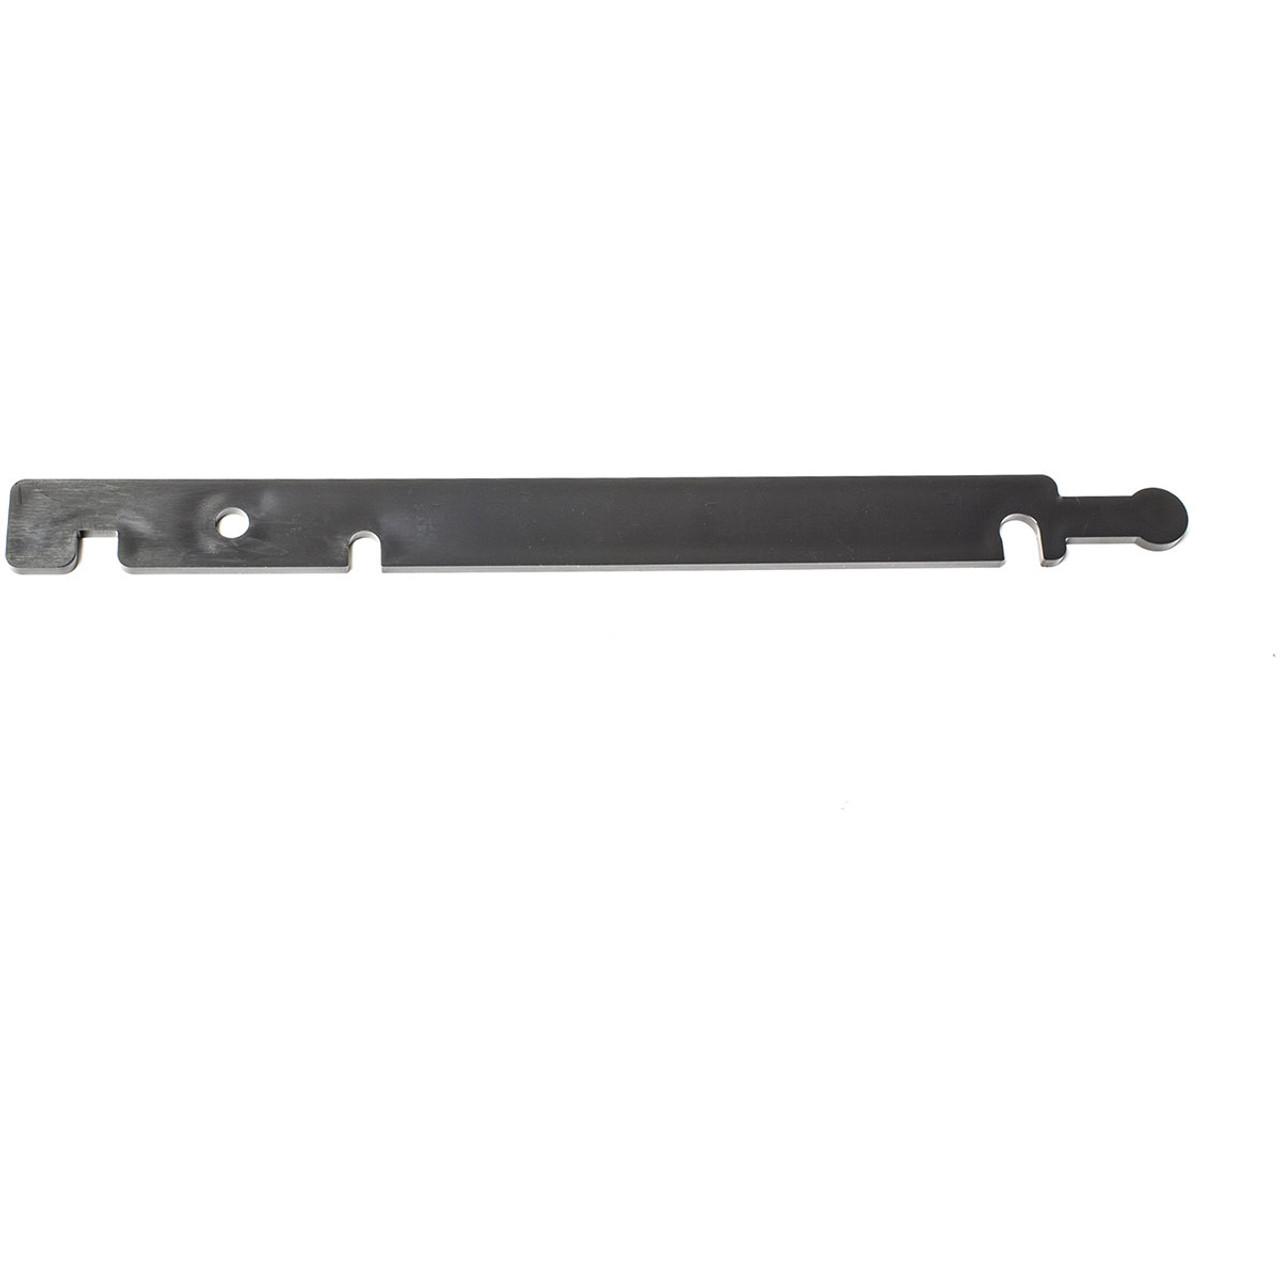 Shift Cable Tool 18-9806E